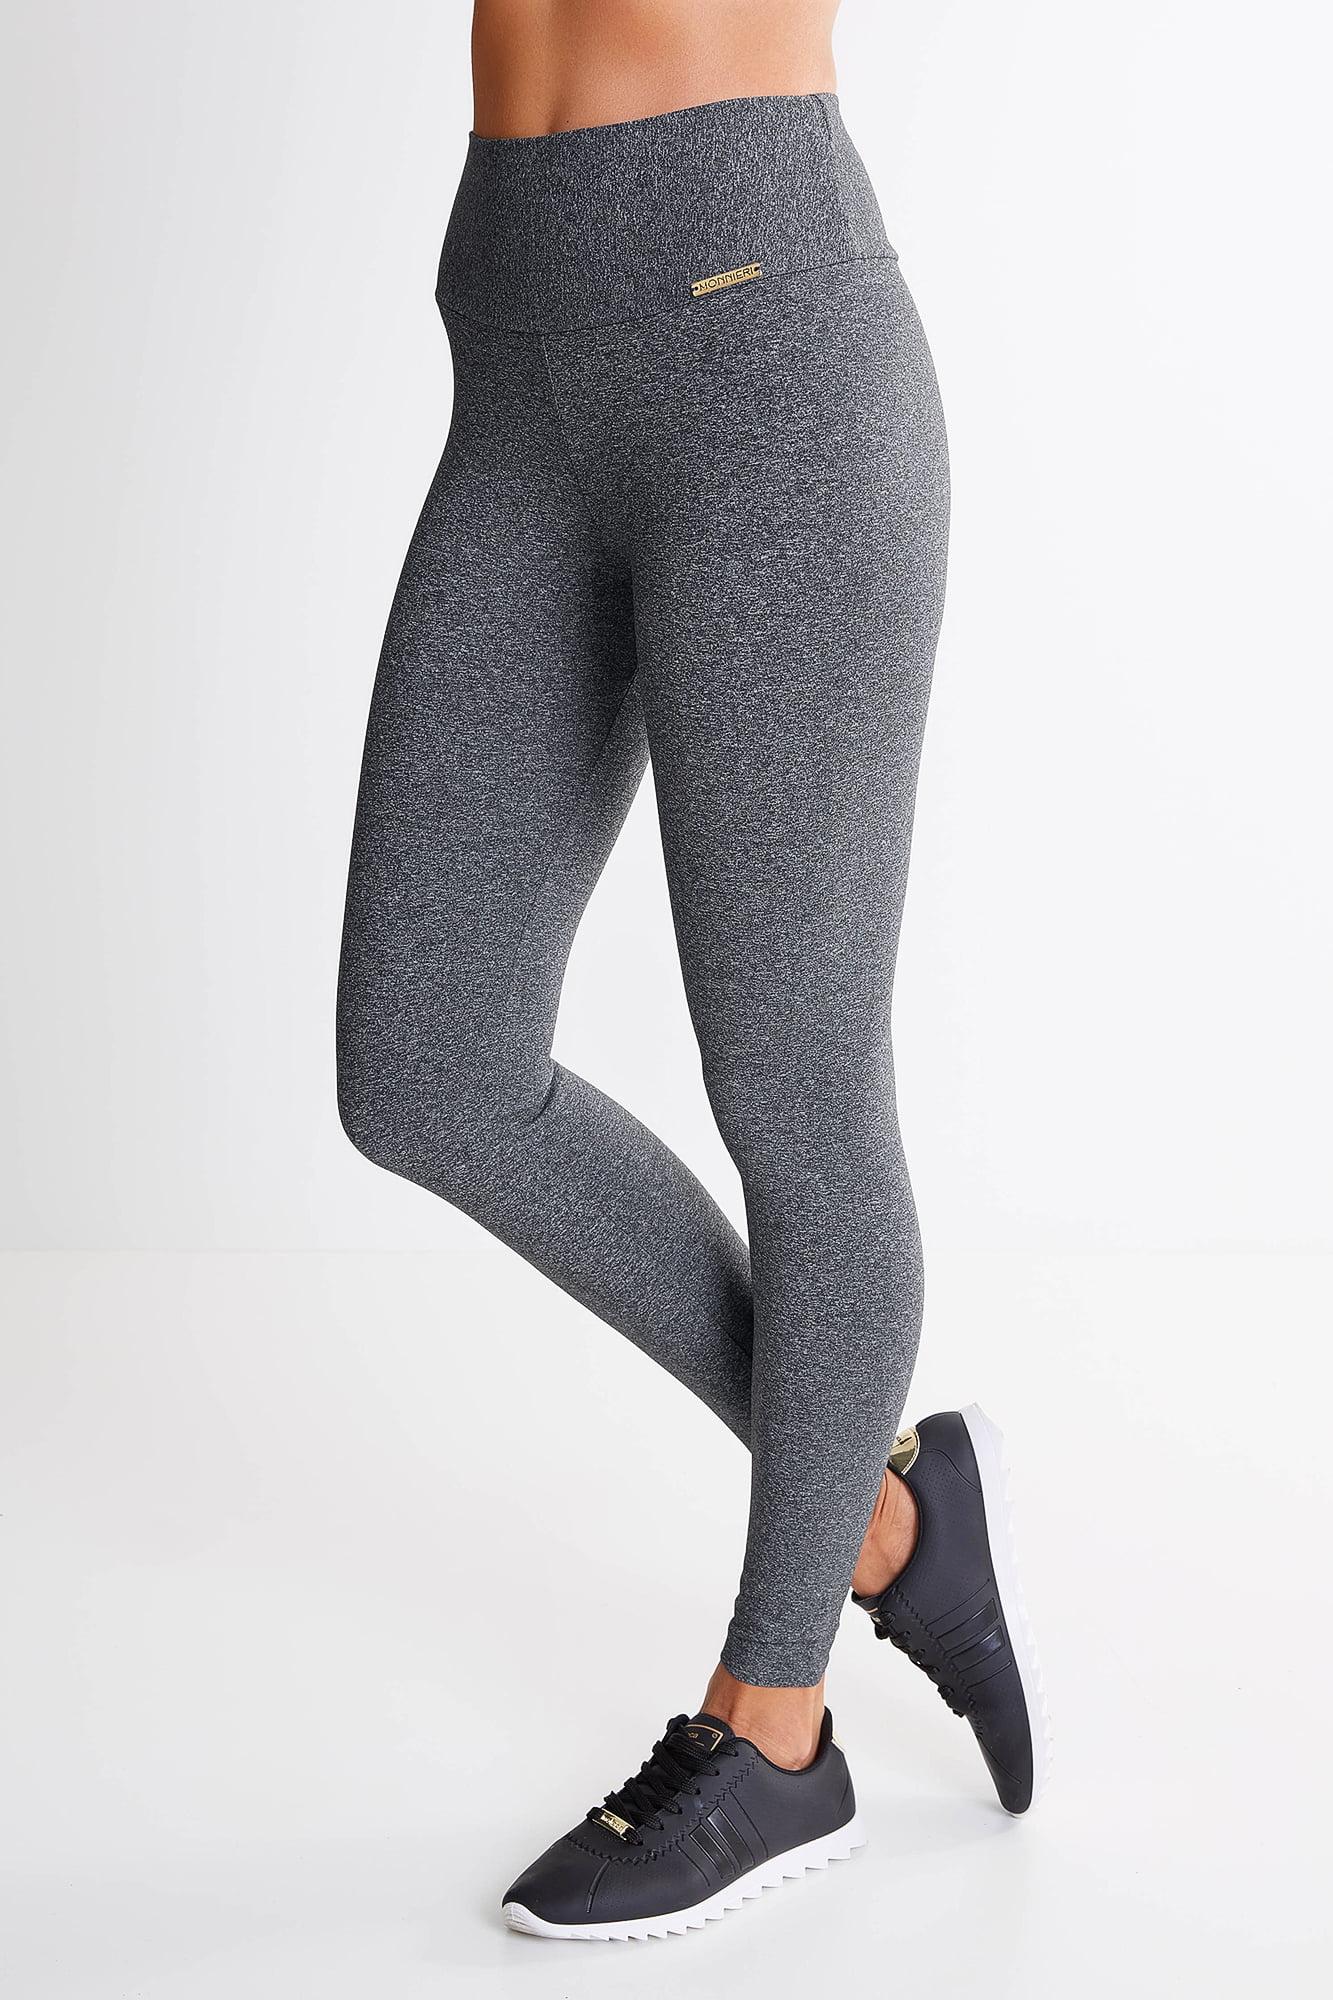 Calça Legging Cinza Escuro Mulheres Altas - Comprimento Personalizado